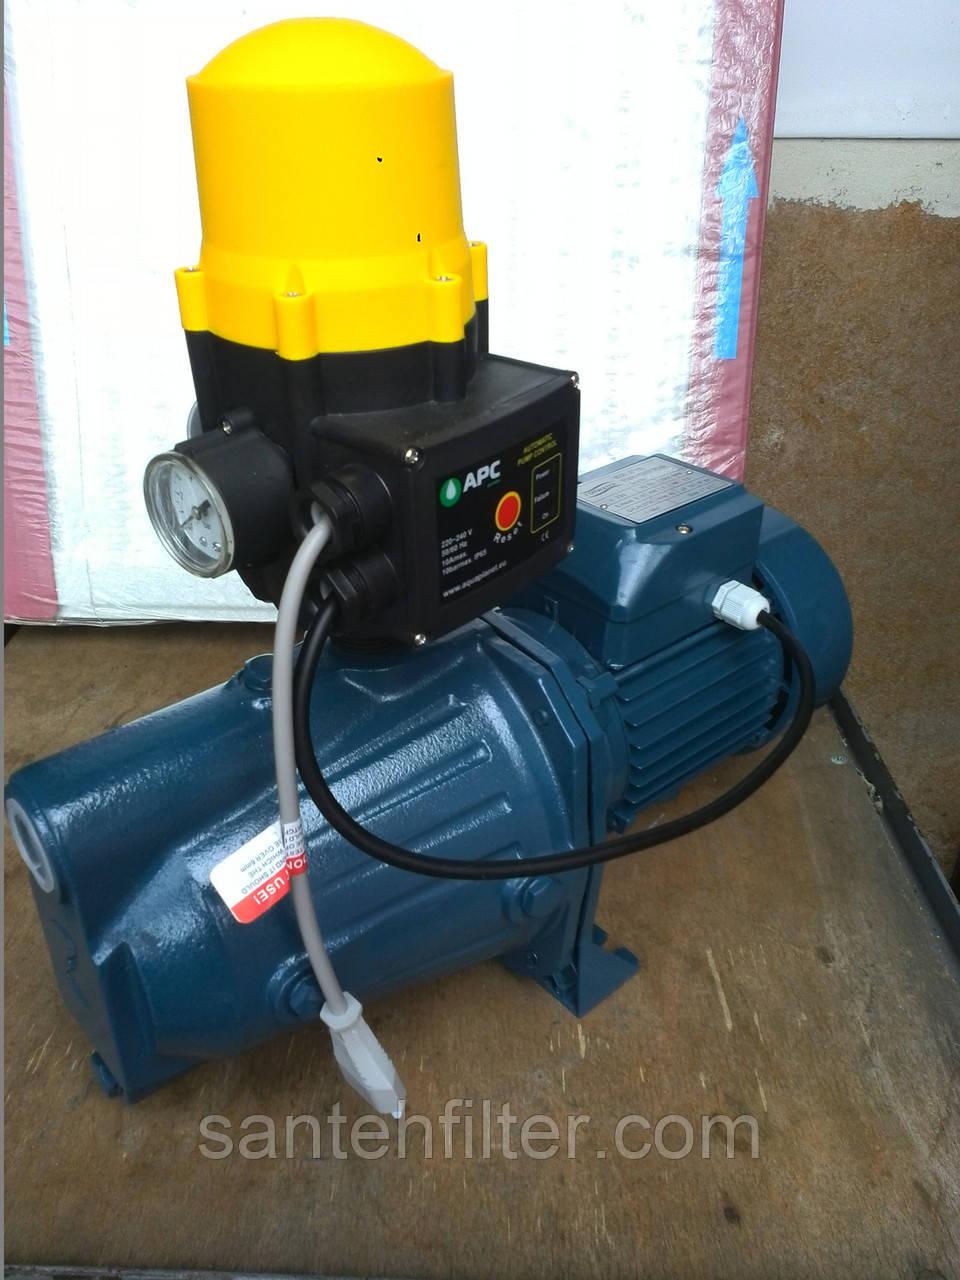 Насосная станция JET100L 1.1 кВт Forwater с регулятором давления